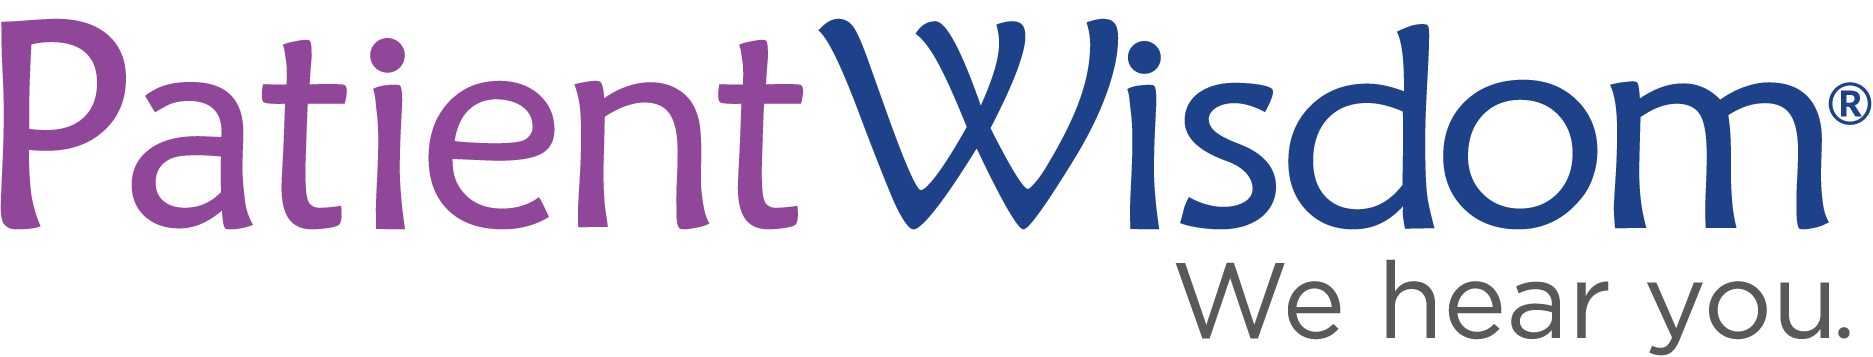 PatientWisdom patient engagement software solution | PatientWisdom